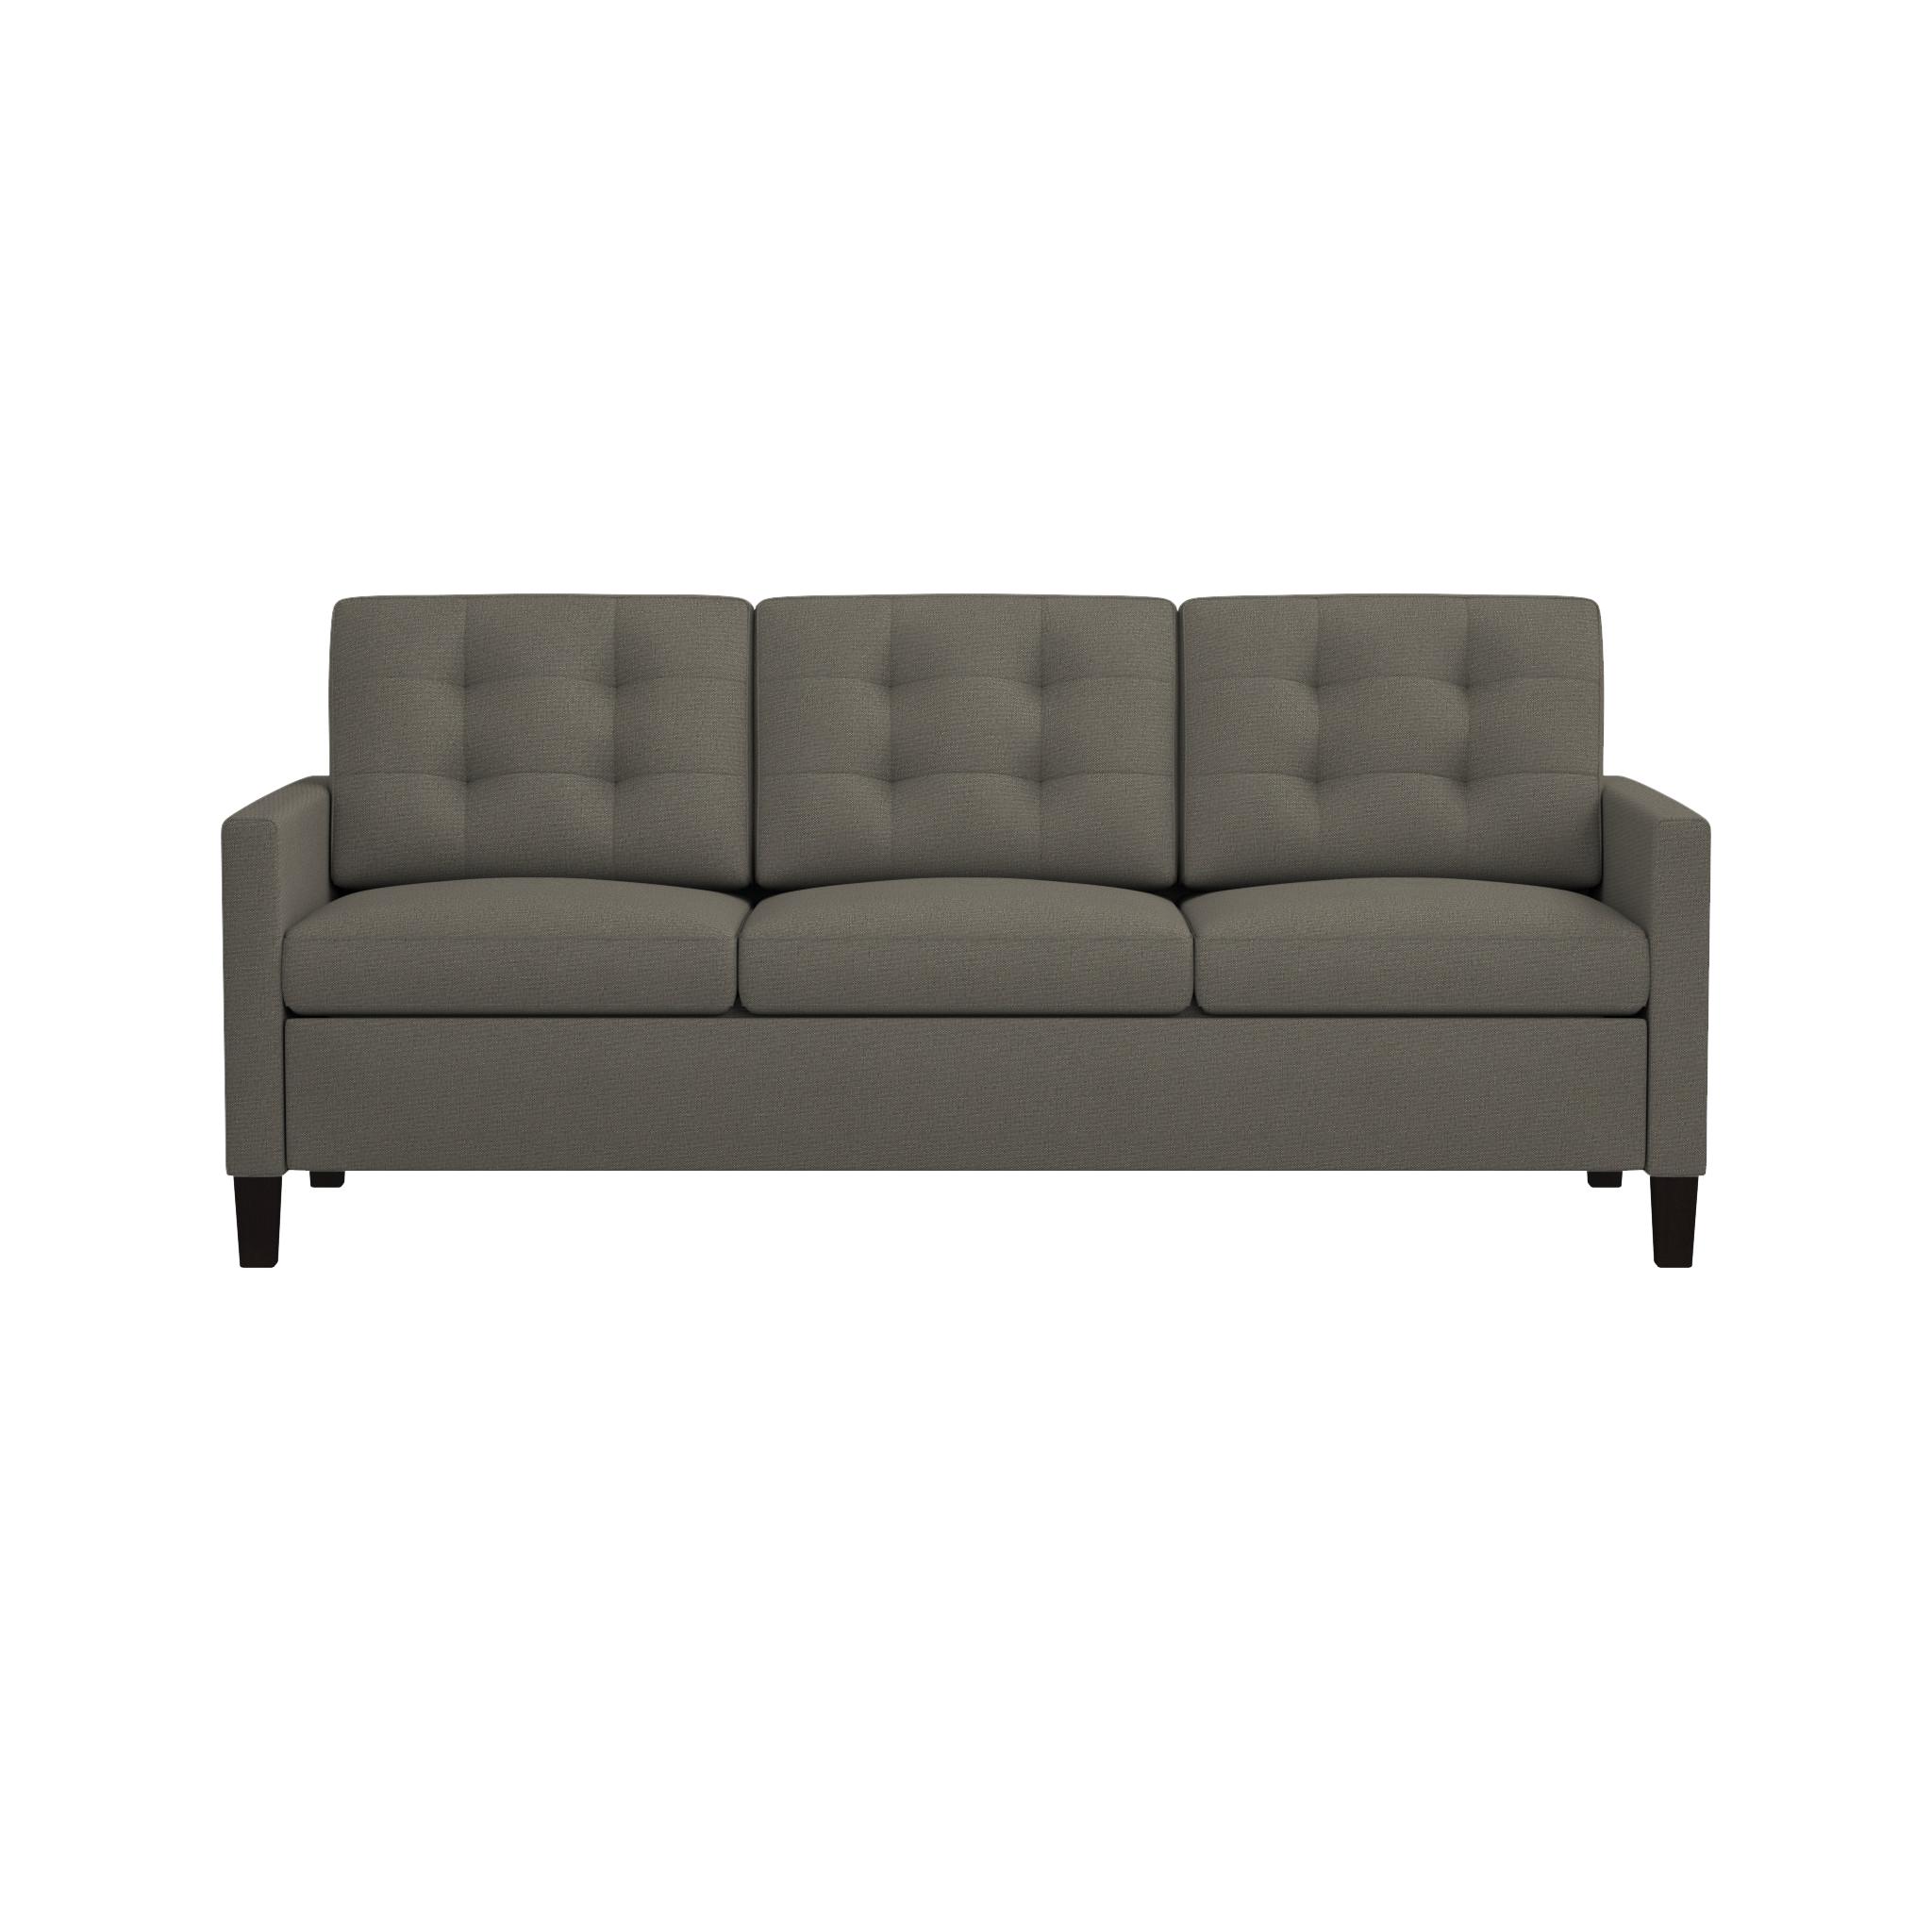 Karnes King Sleeper Sofa Crate And Barrel Comfortable Futon